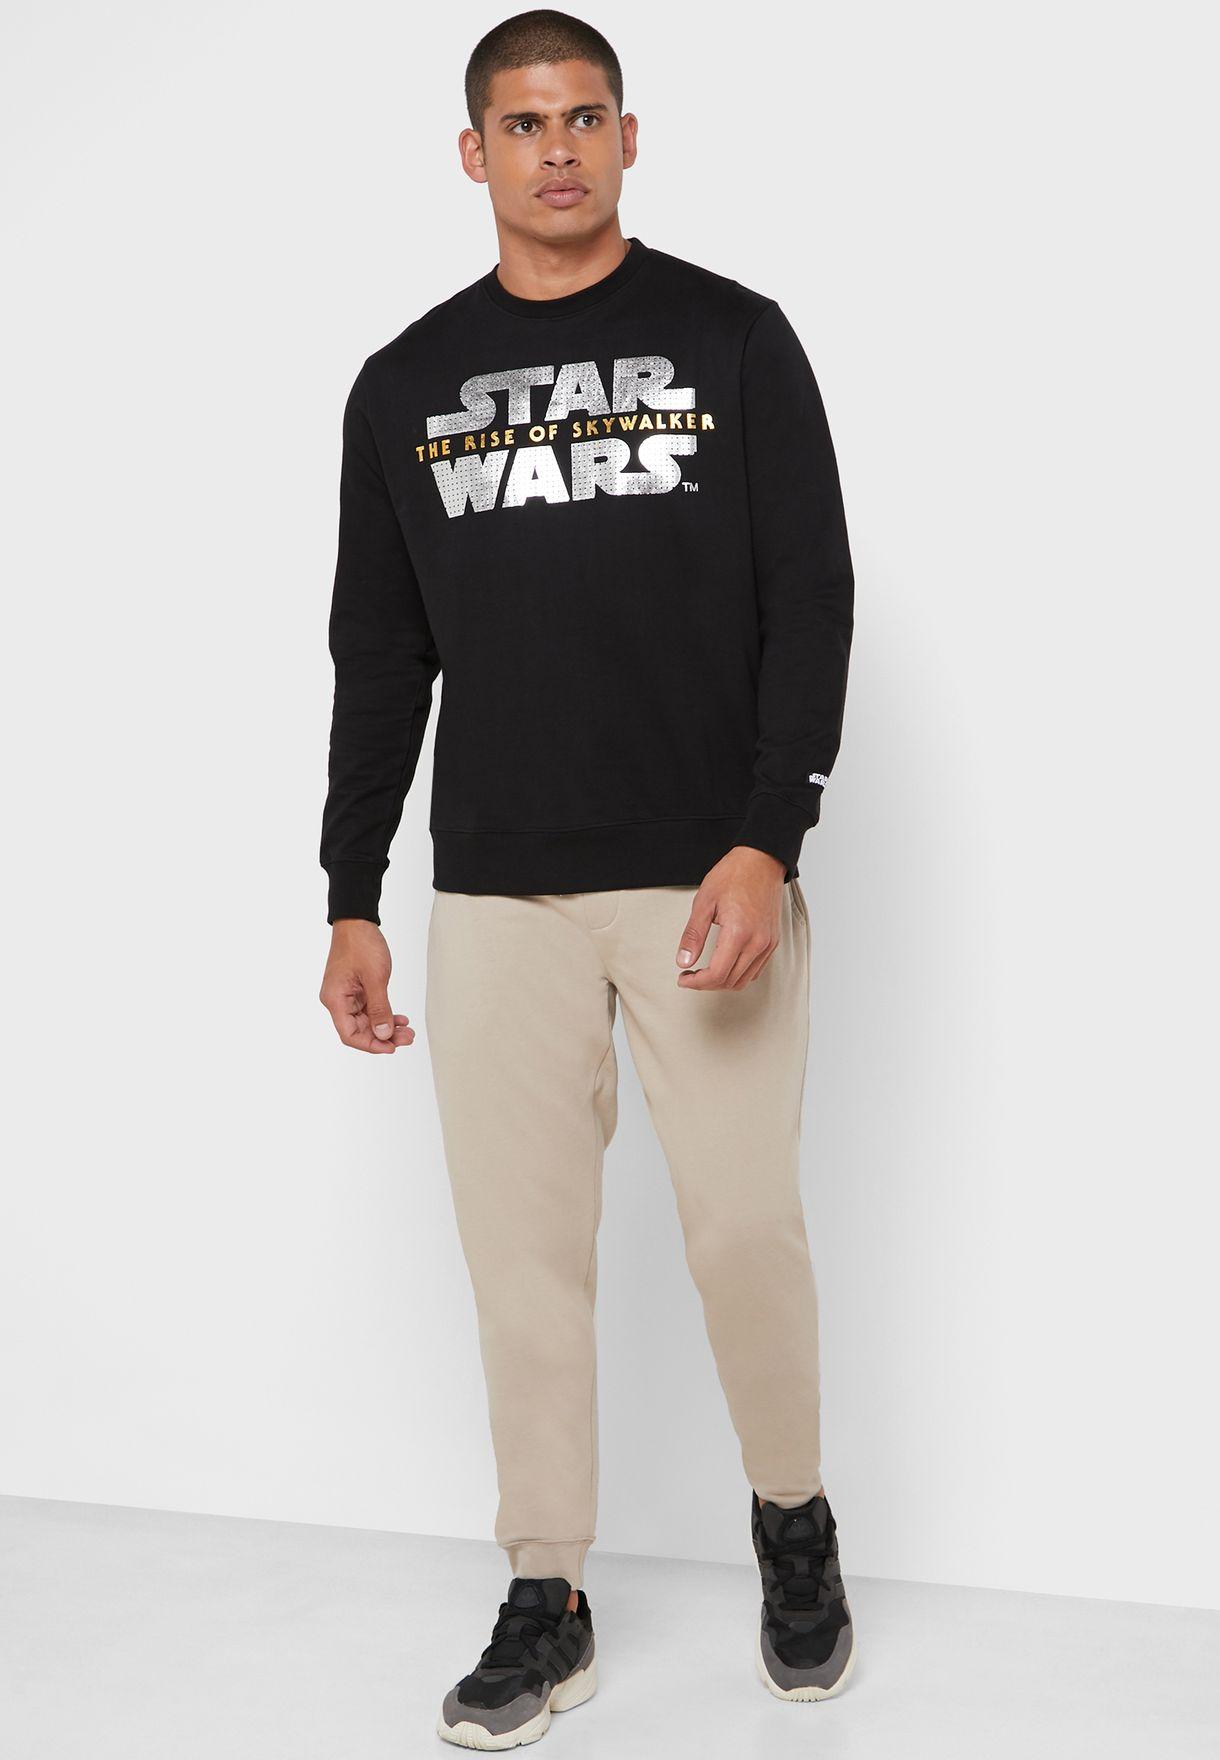 Rise Of Skywalker Sweater